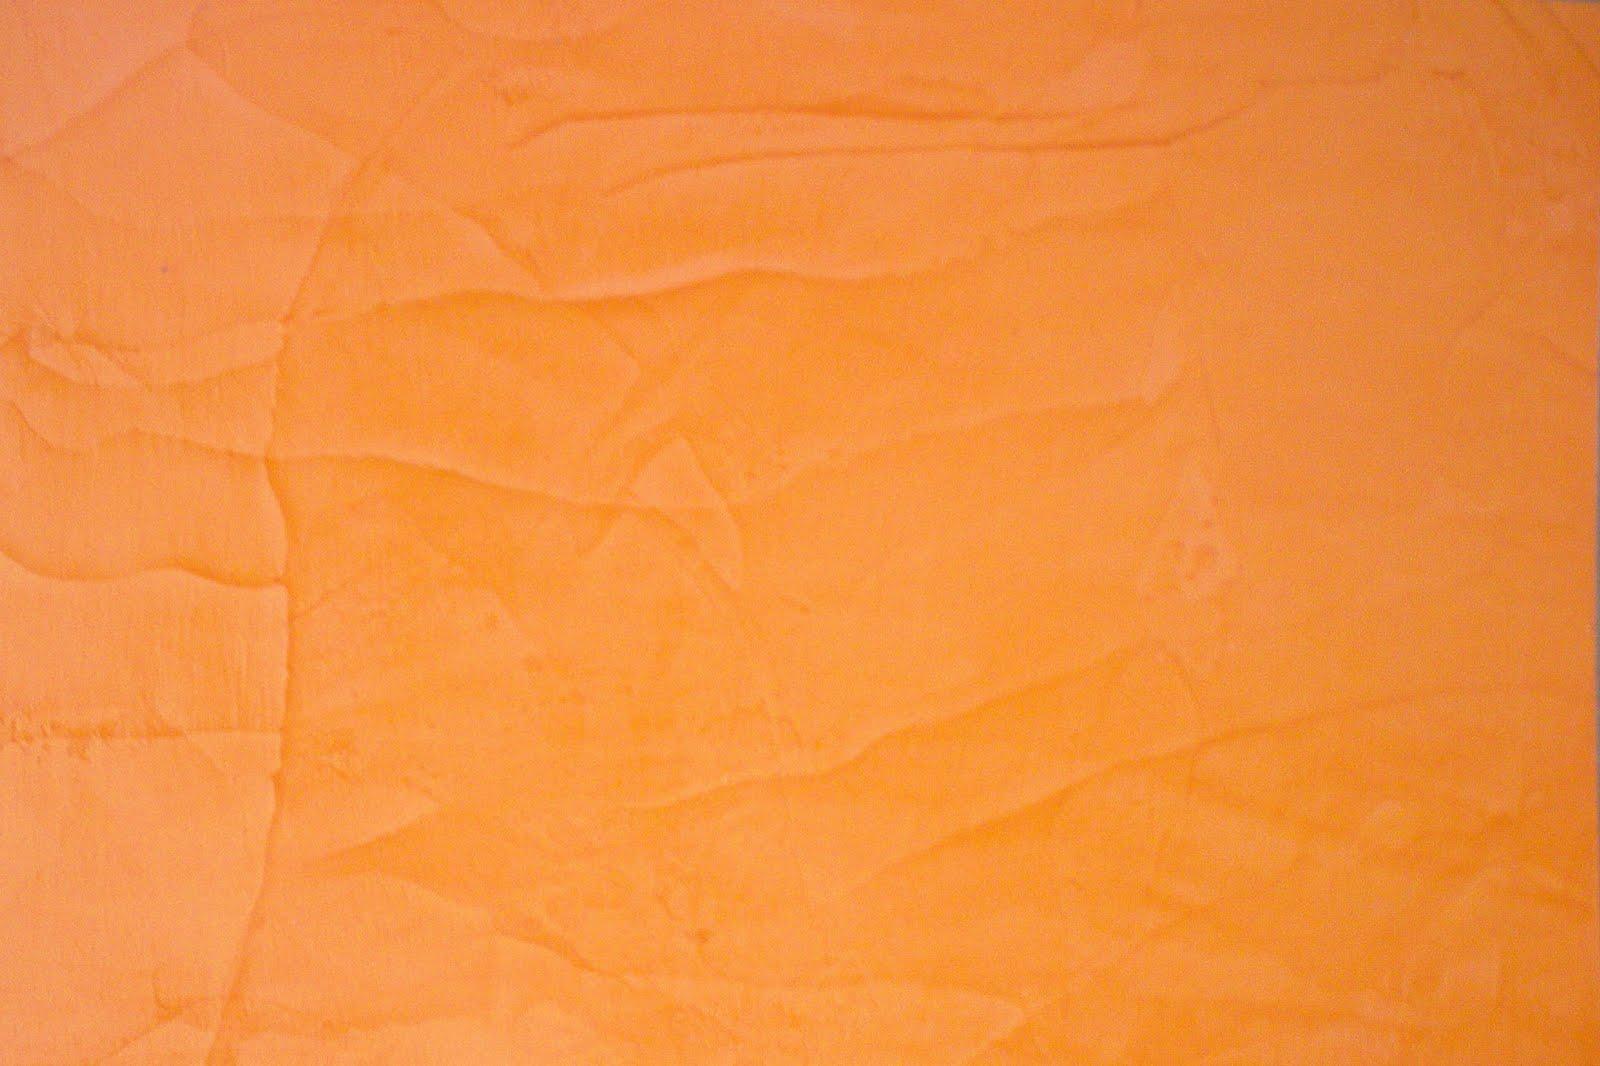 Canivilo arte texturas muros - Pintura color ladrillo ...